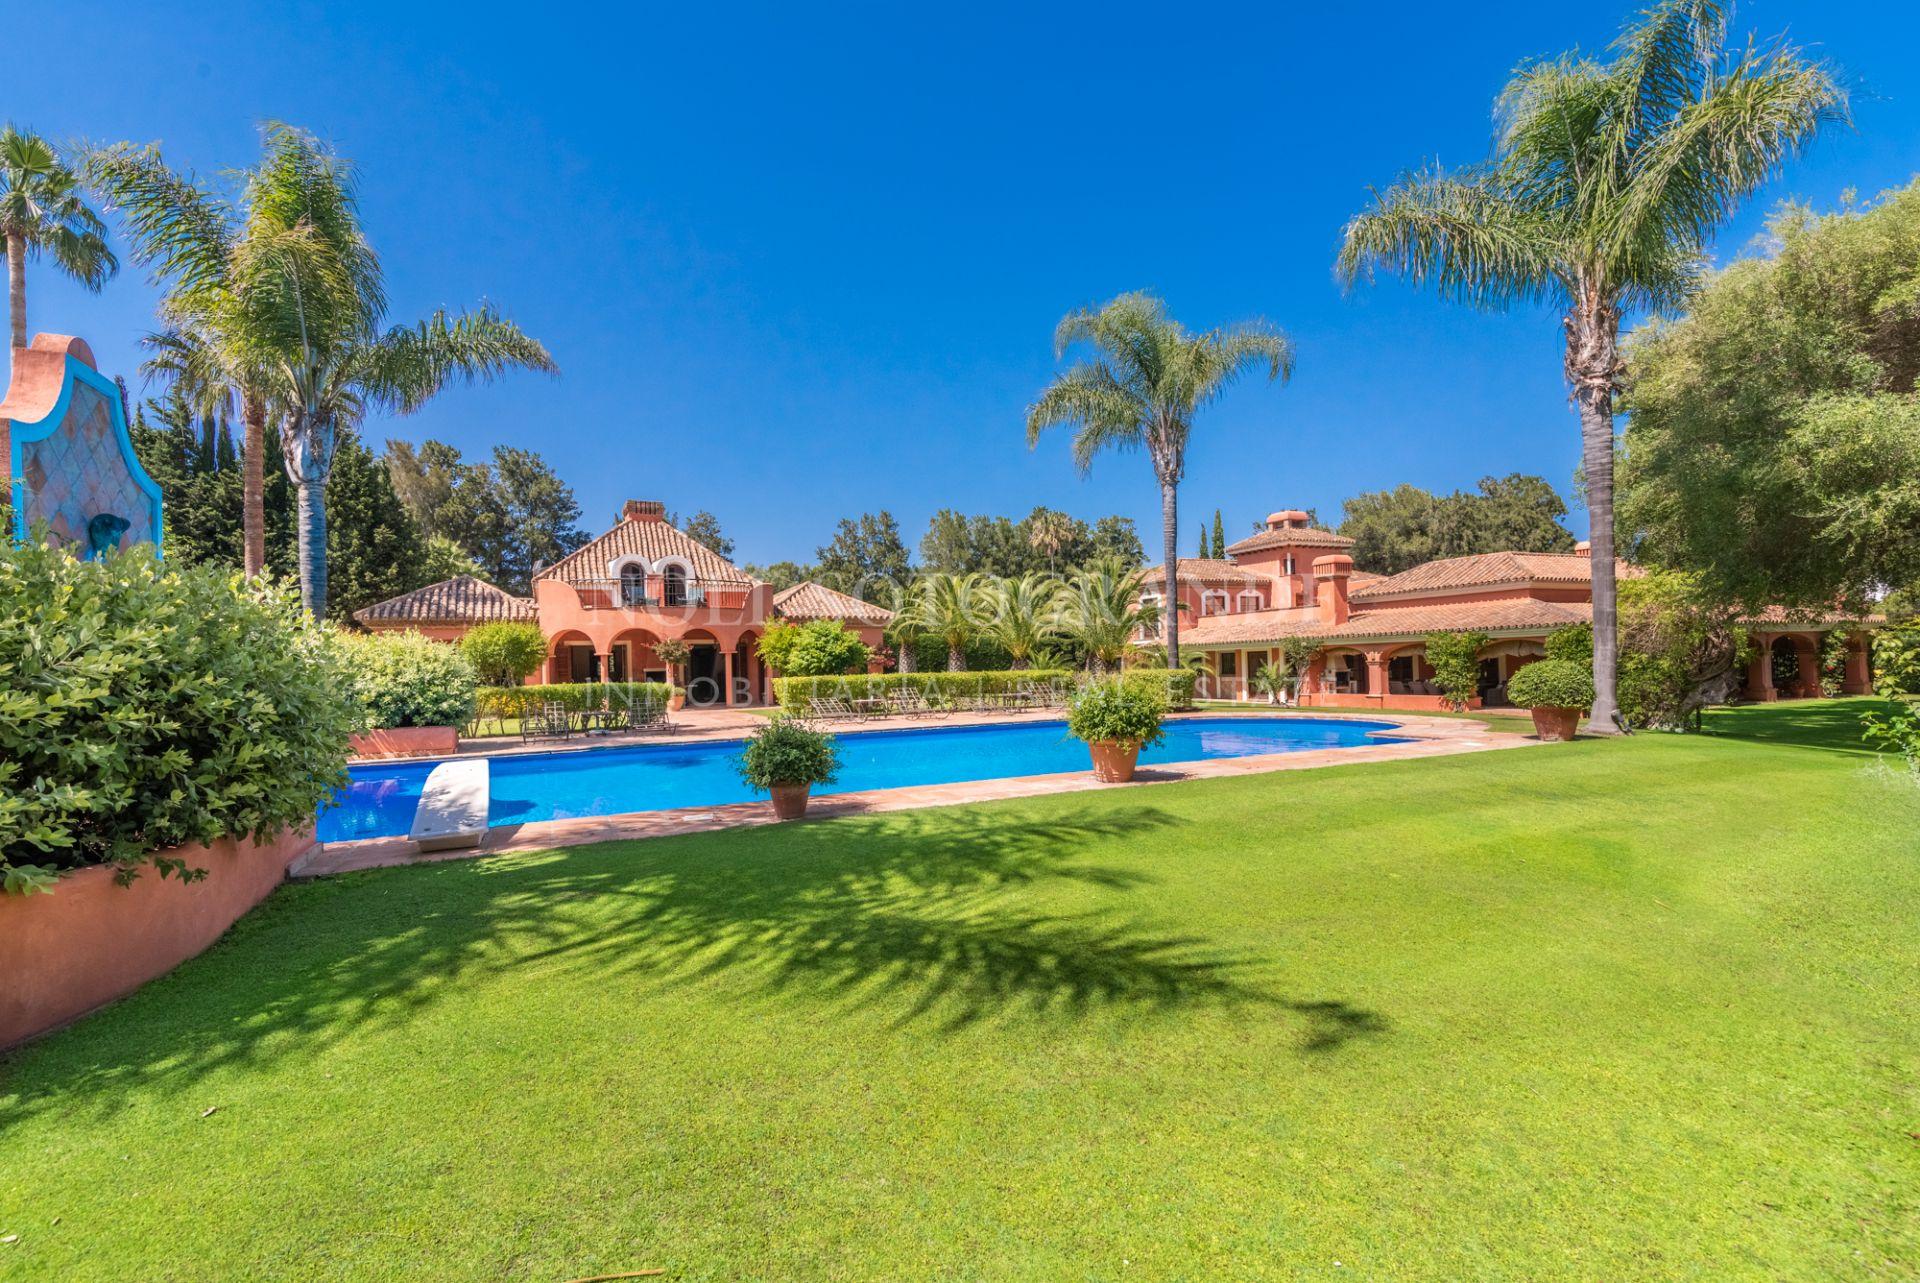 Sotogrande Costa, large villa in prime location on large plot.